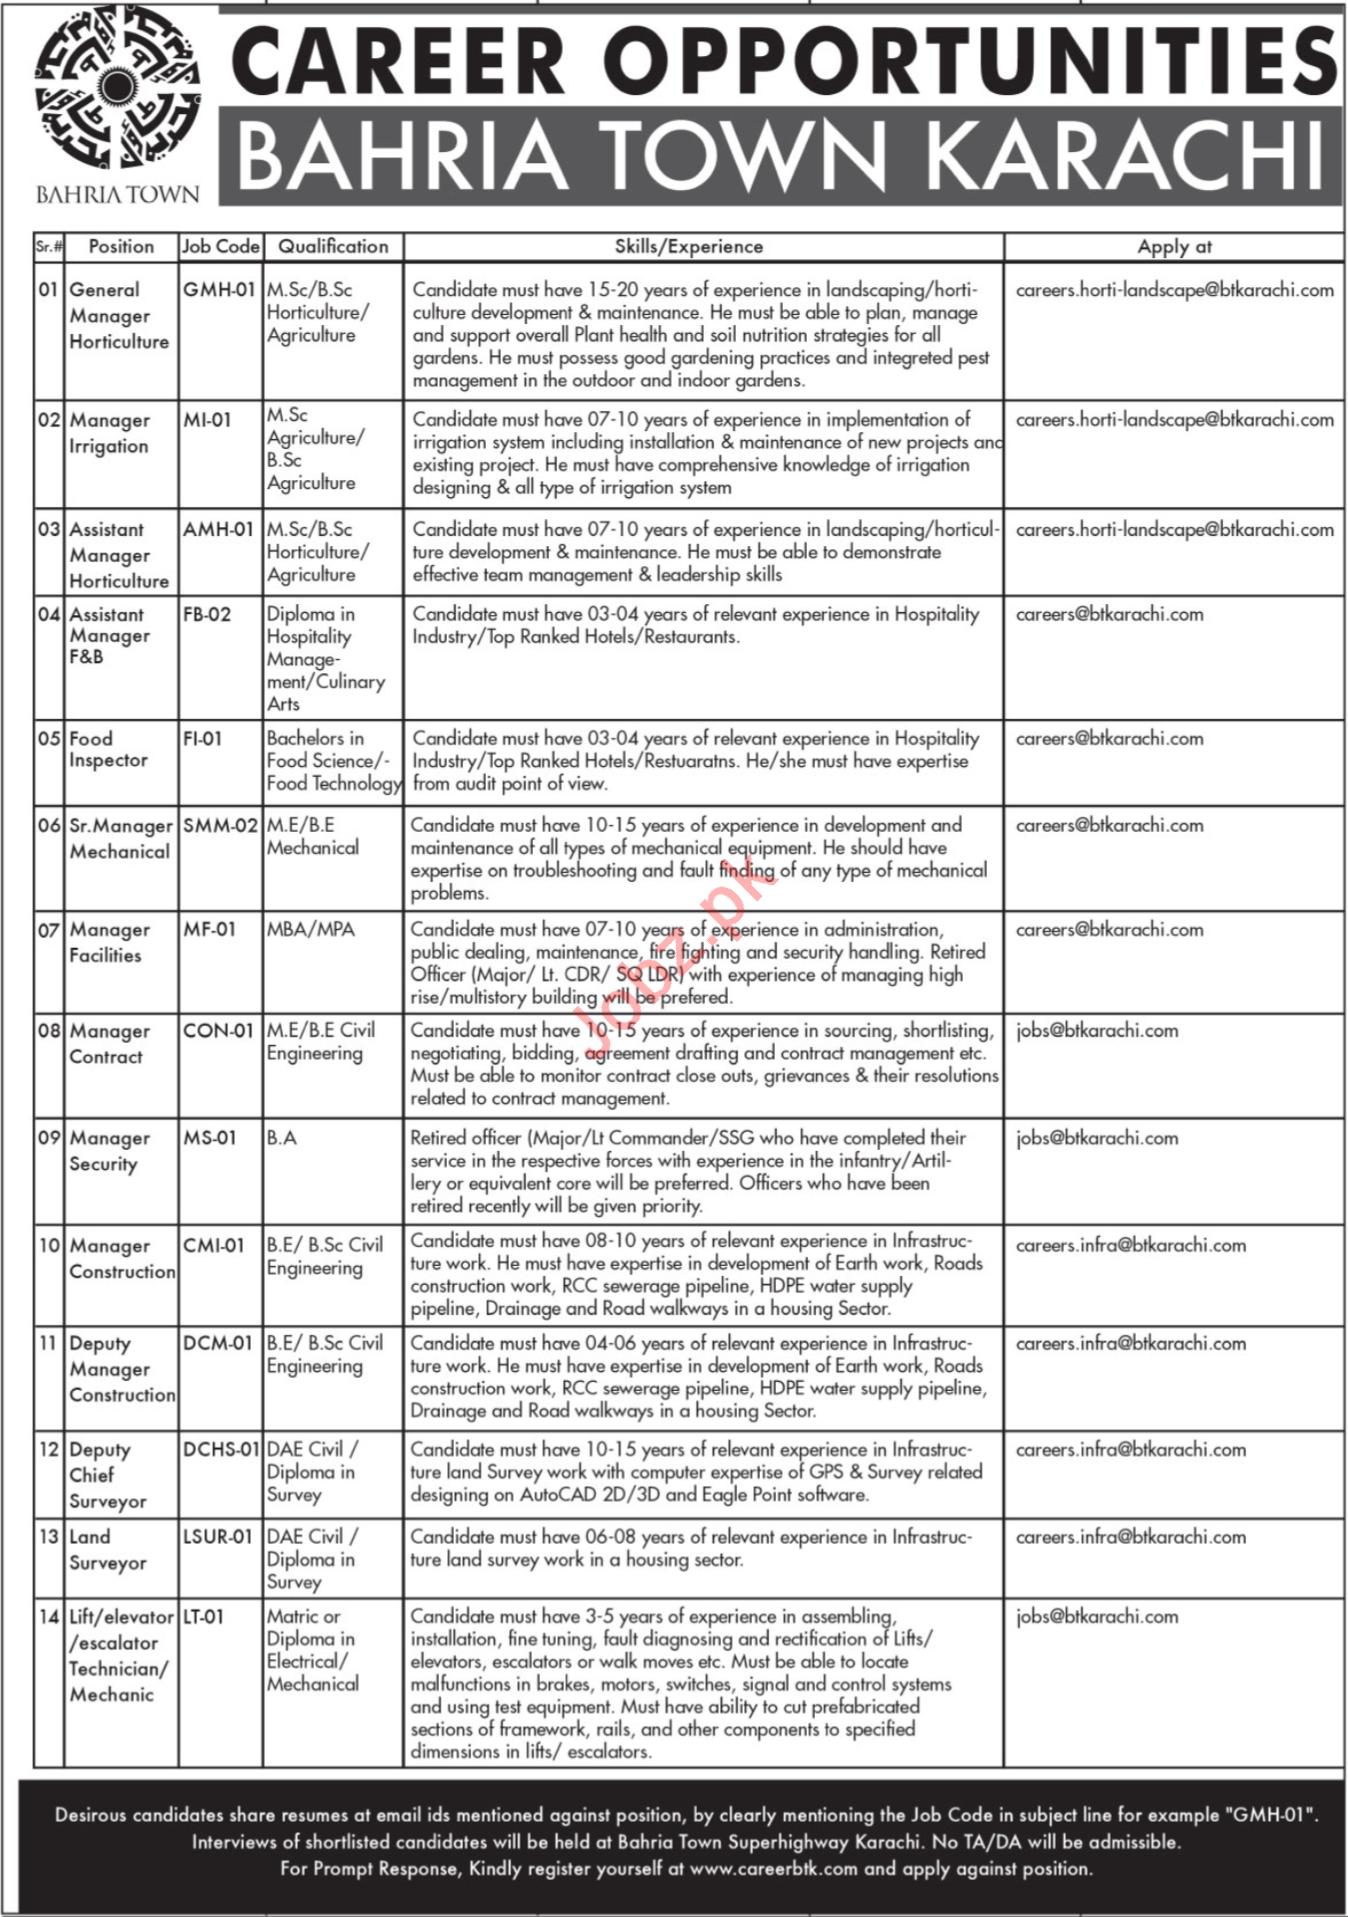 Bahria Town Private Limited Jobs 2019 in Karachi